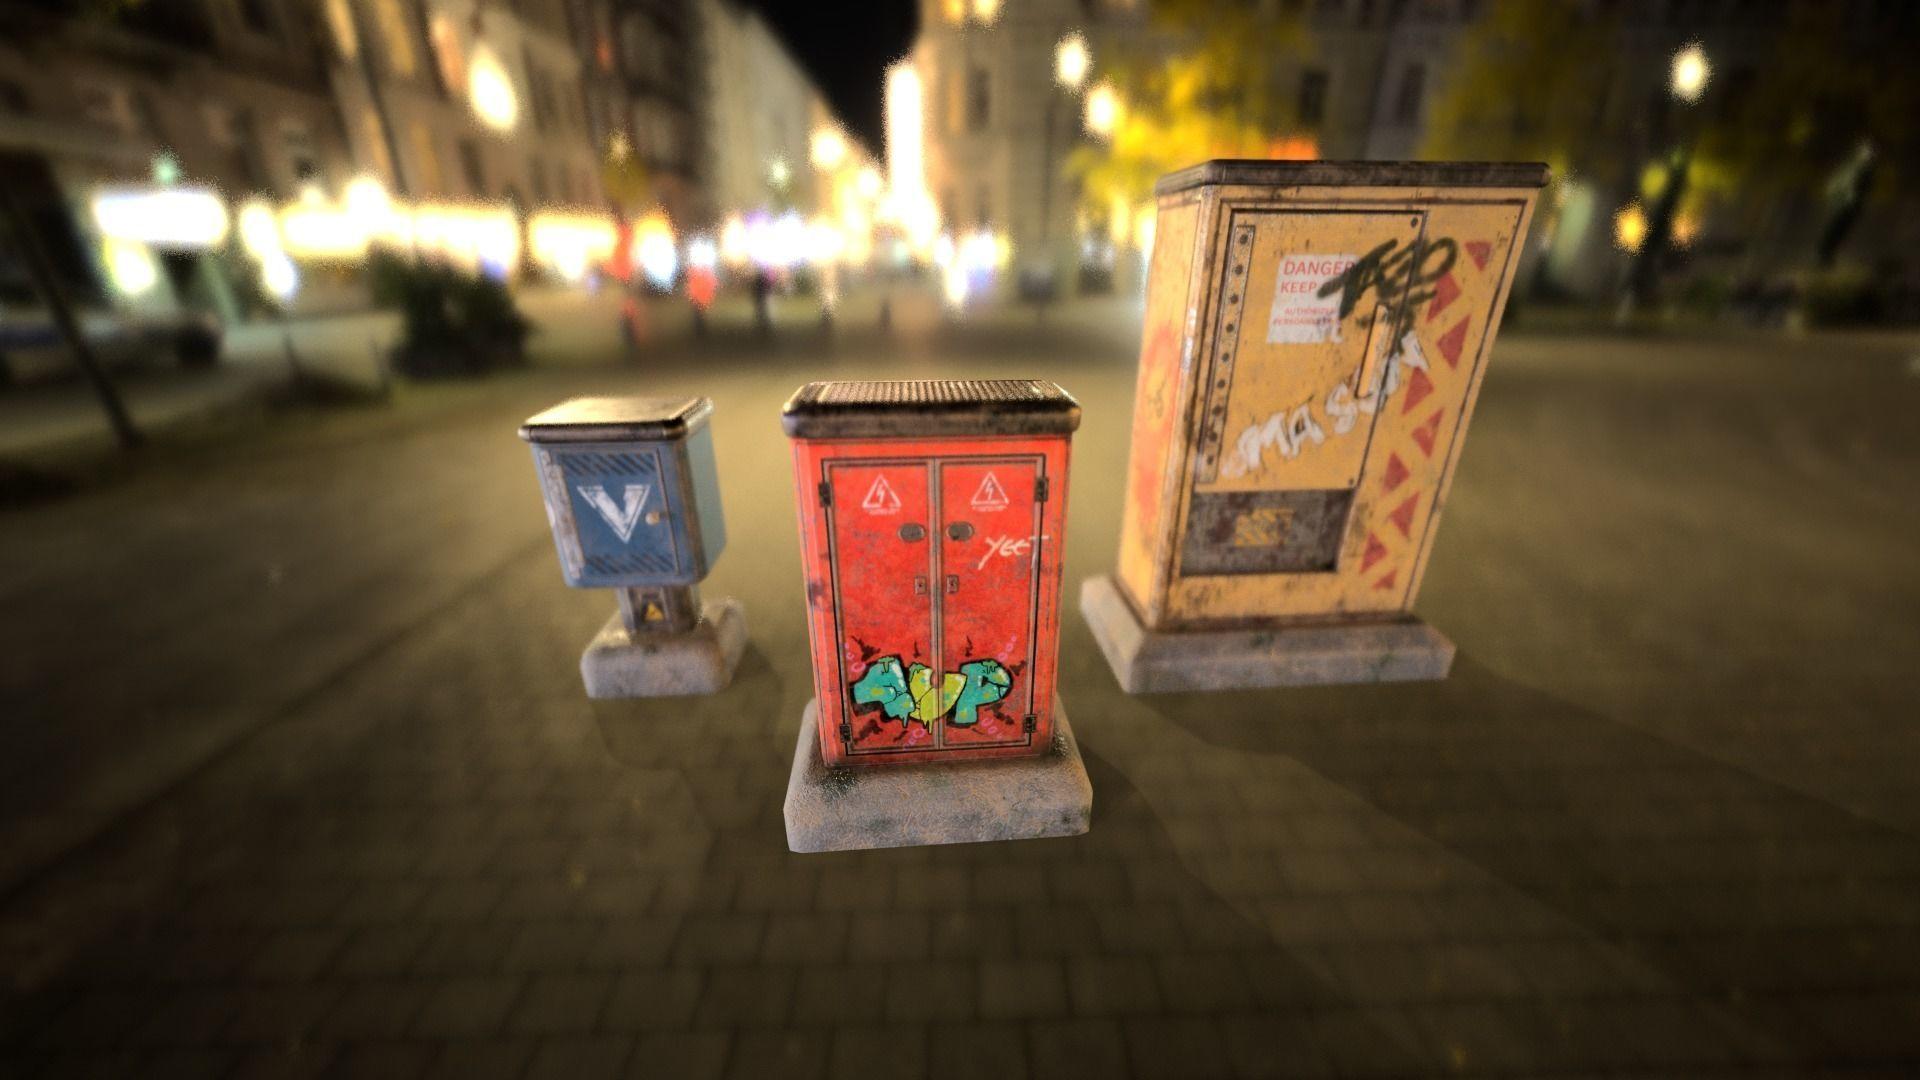 Sci-fi cyberpunk city street electrical boxes